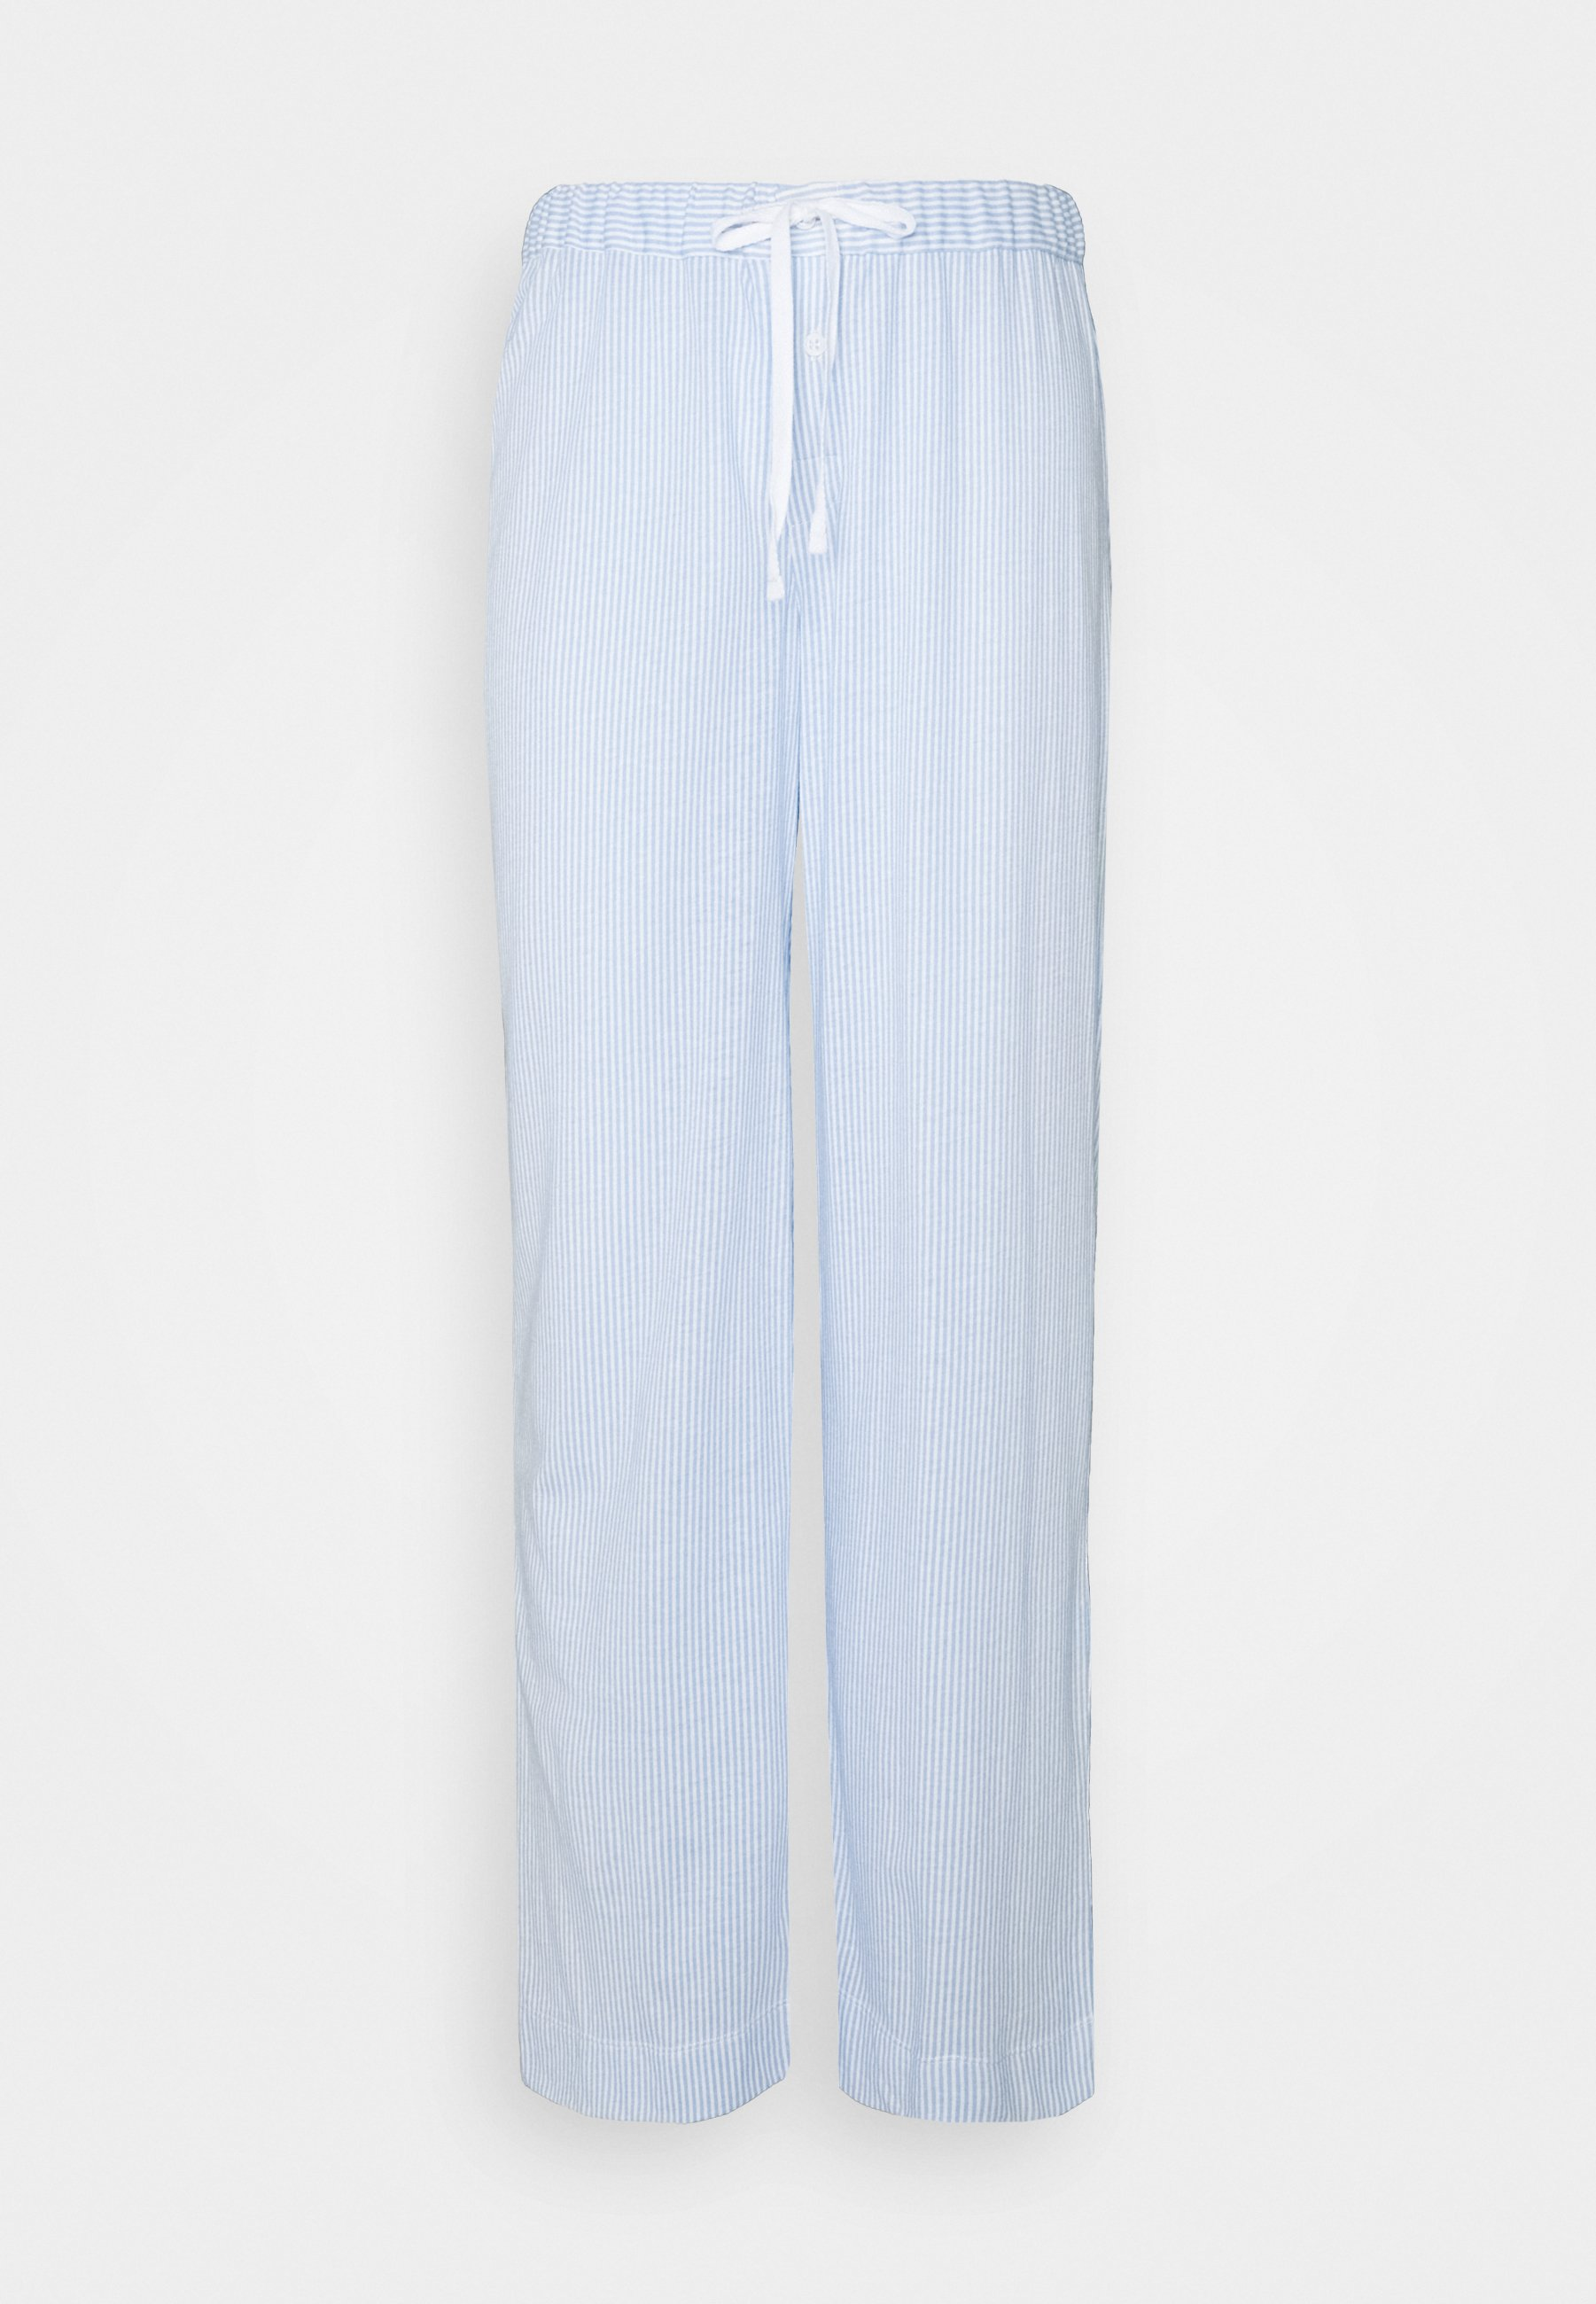 Donna SEPARATE LONG PANTS - Pantaloni del pigiama - blue